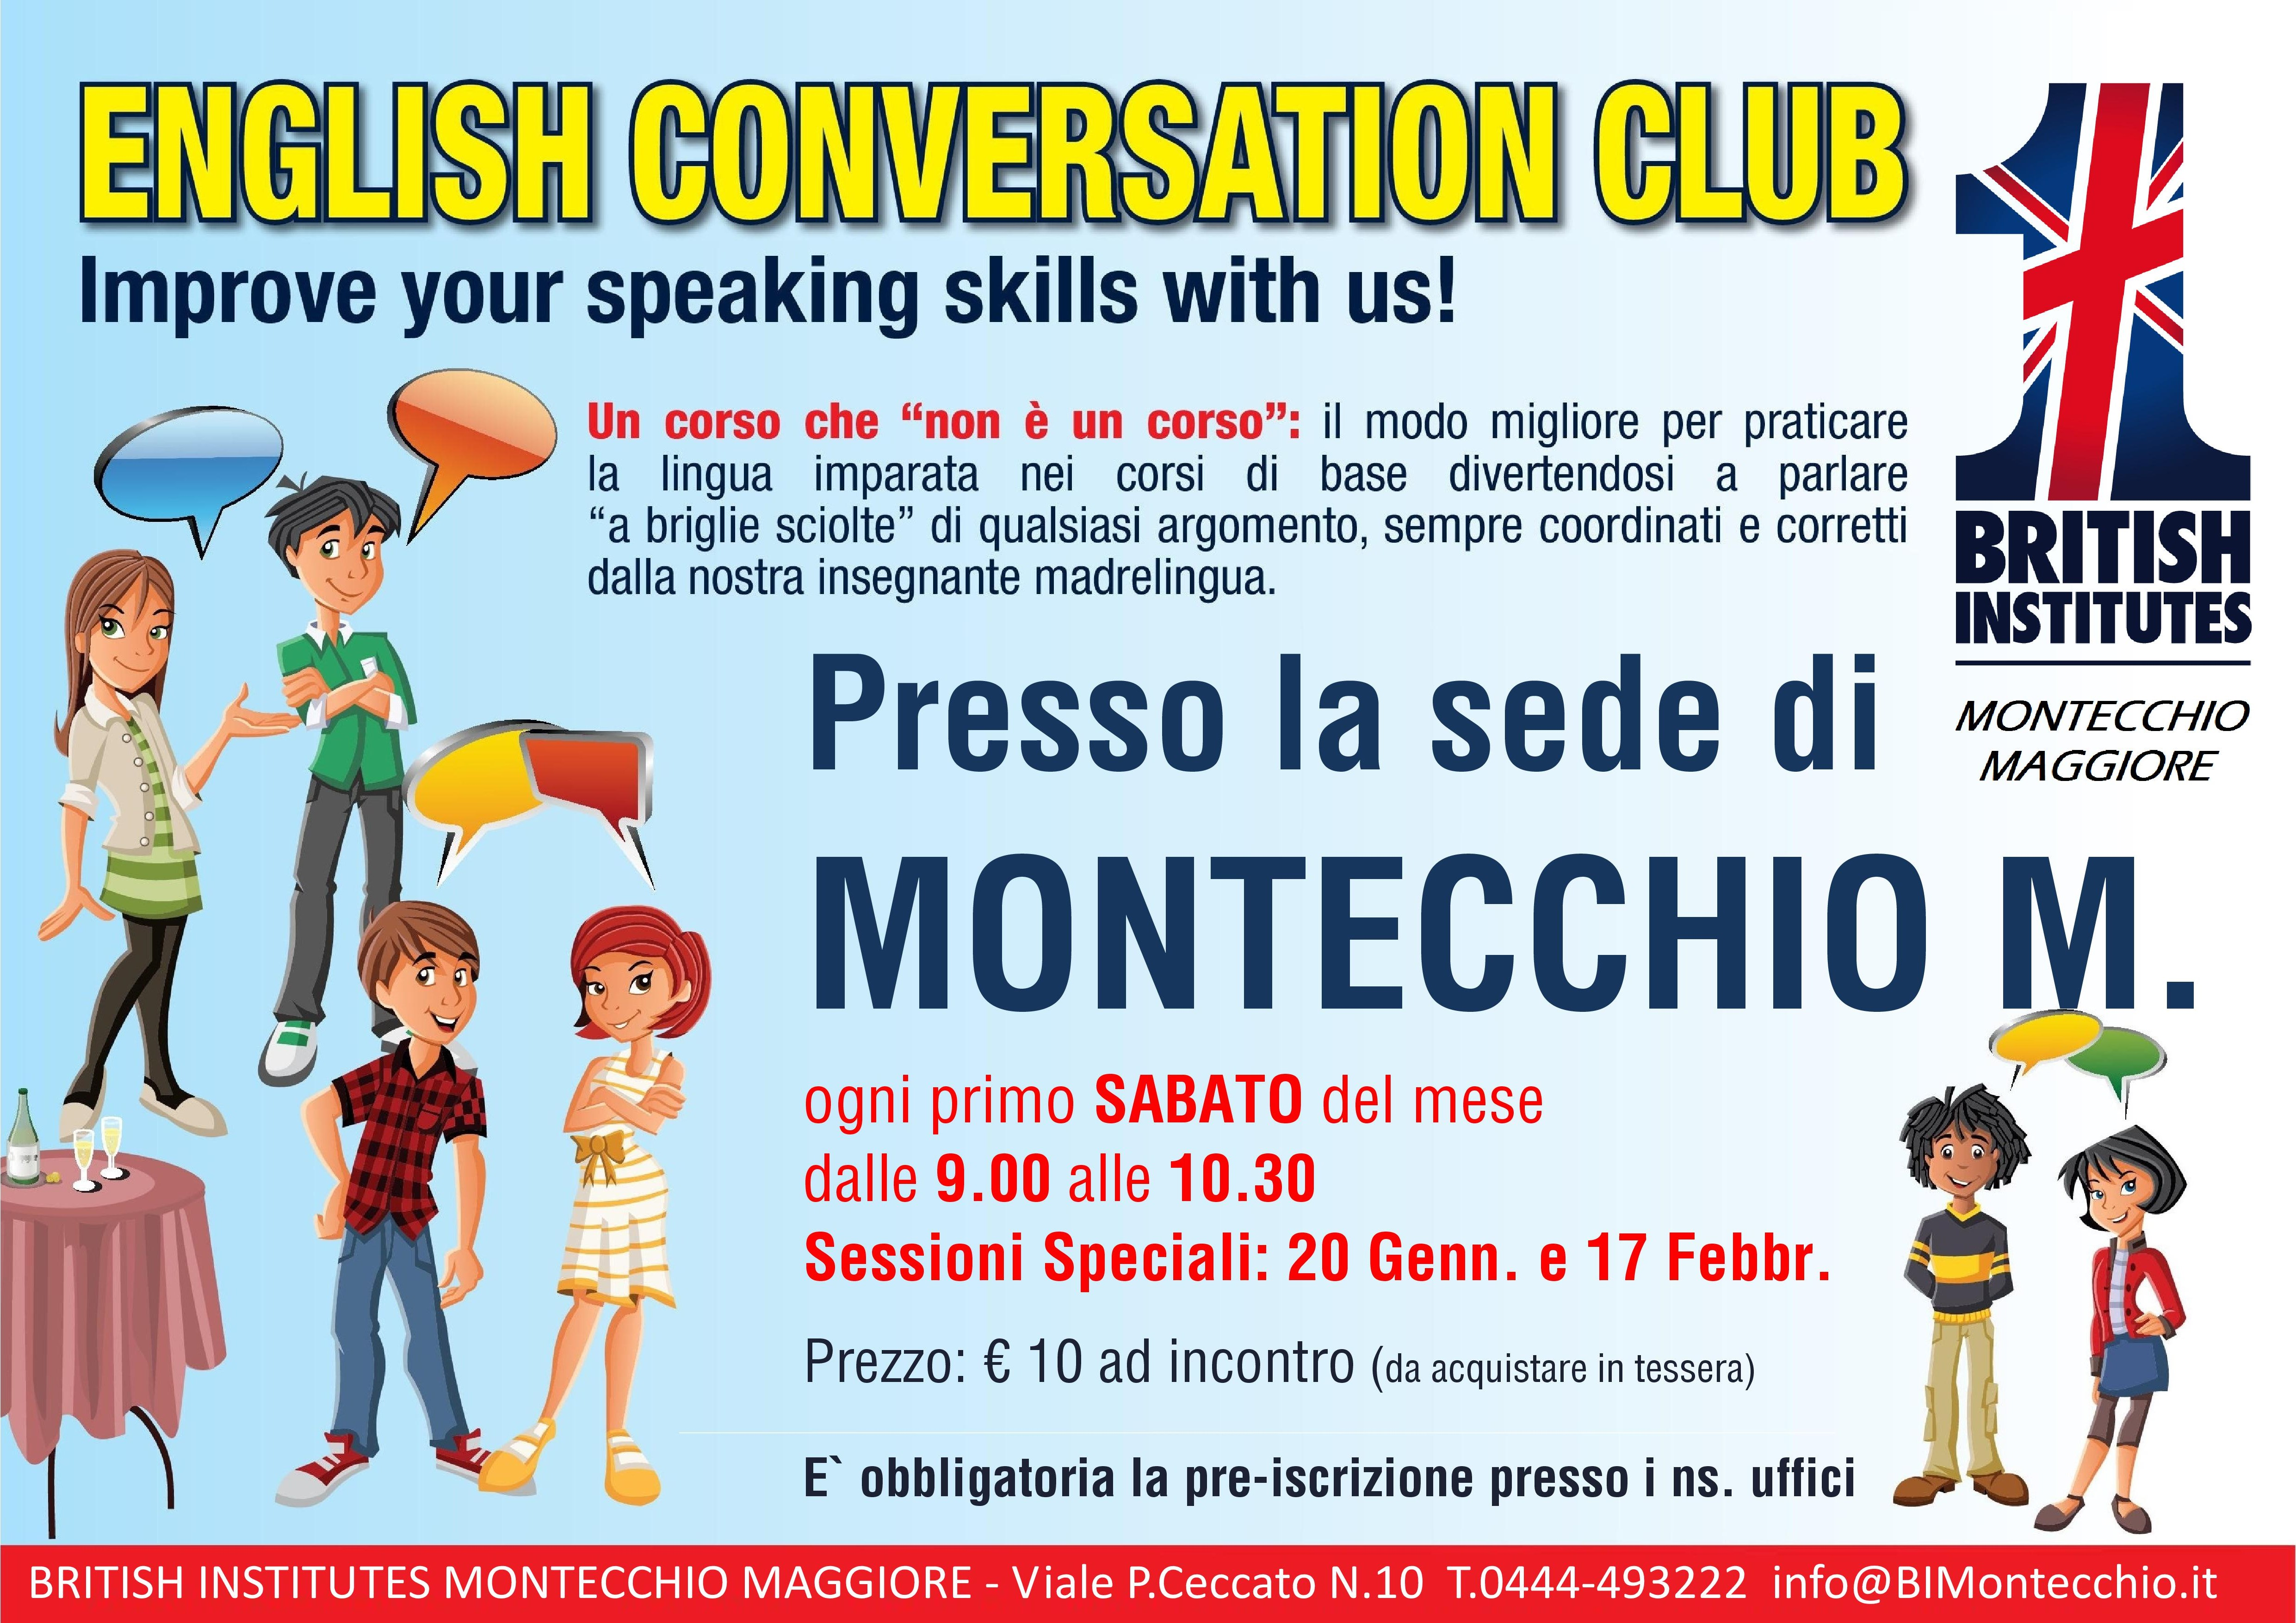 Locandina Conversation Club a Montecchio